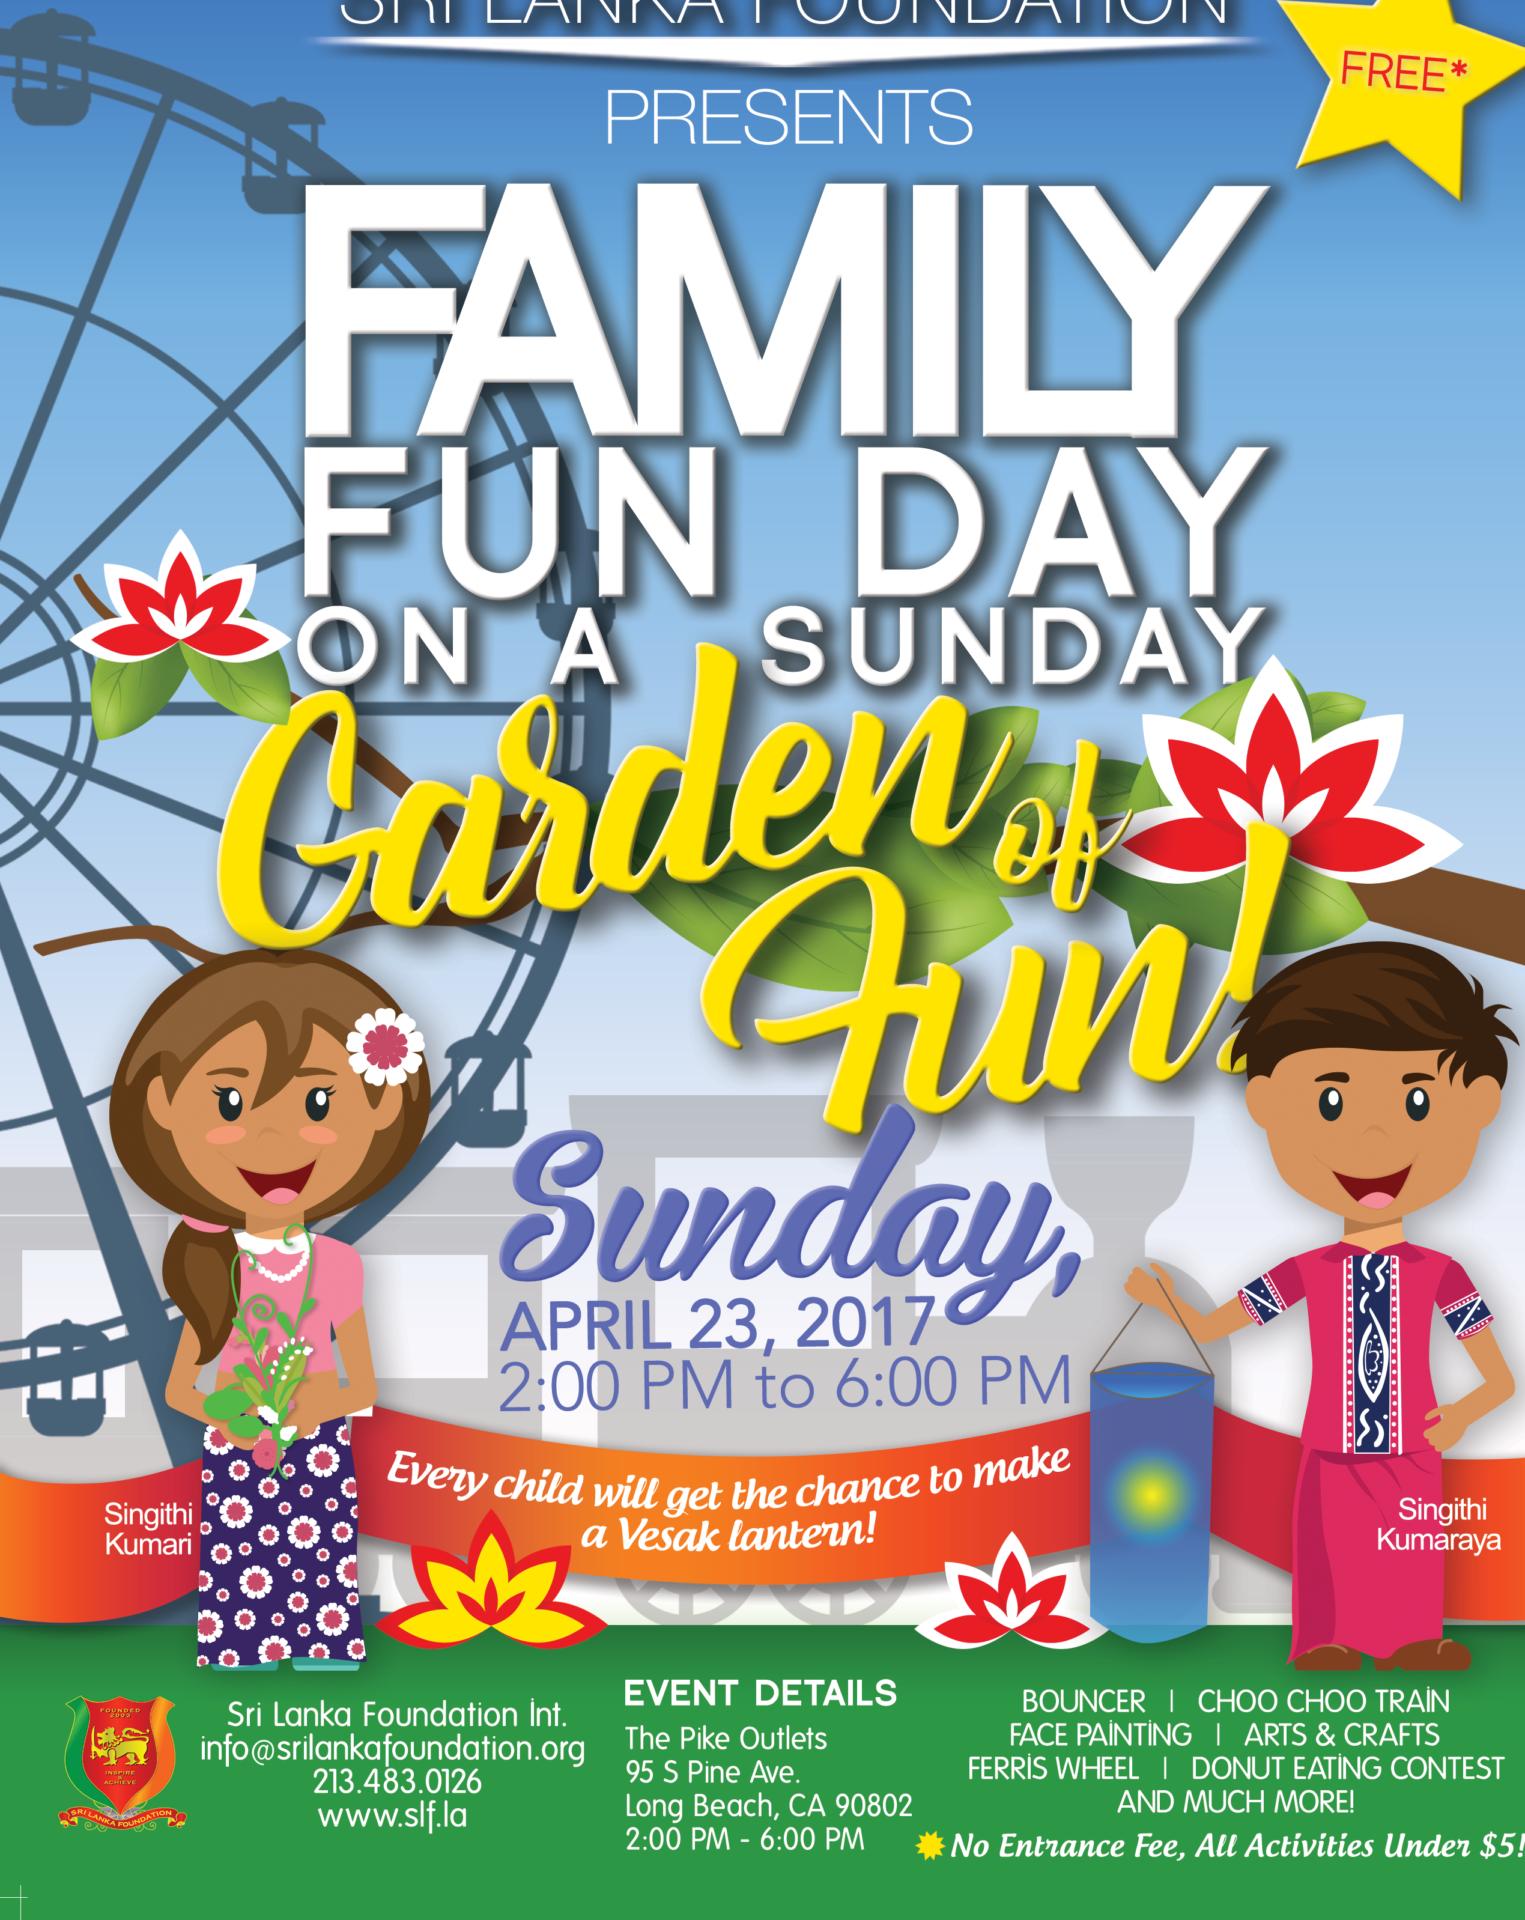 Family Fun Day on a Sunday Garden of Fun! Sathutu Uyana!